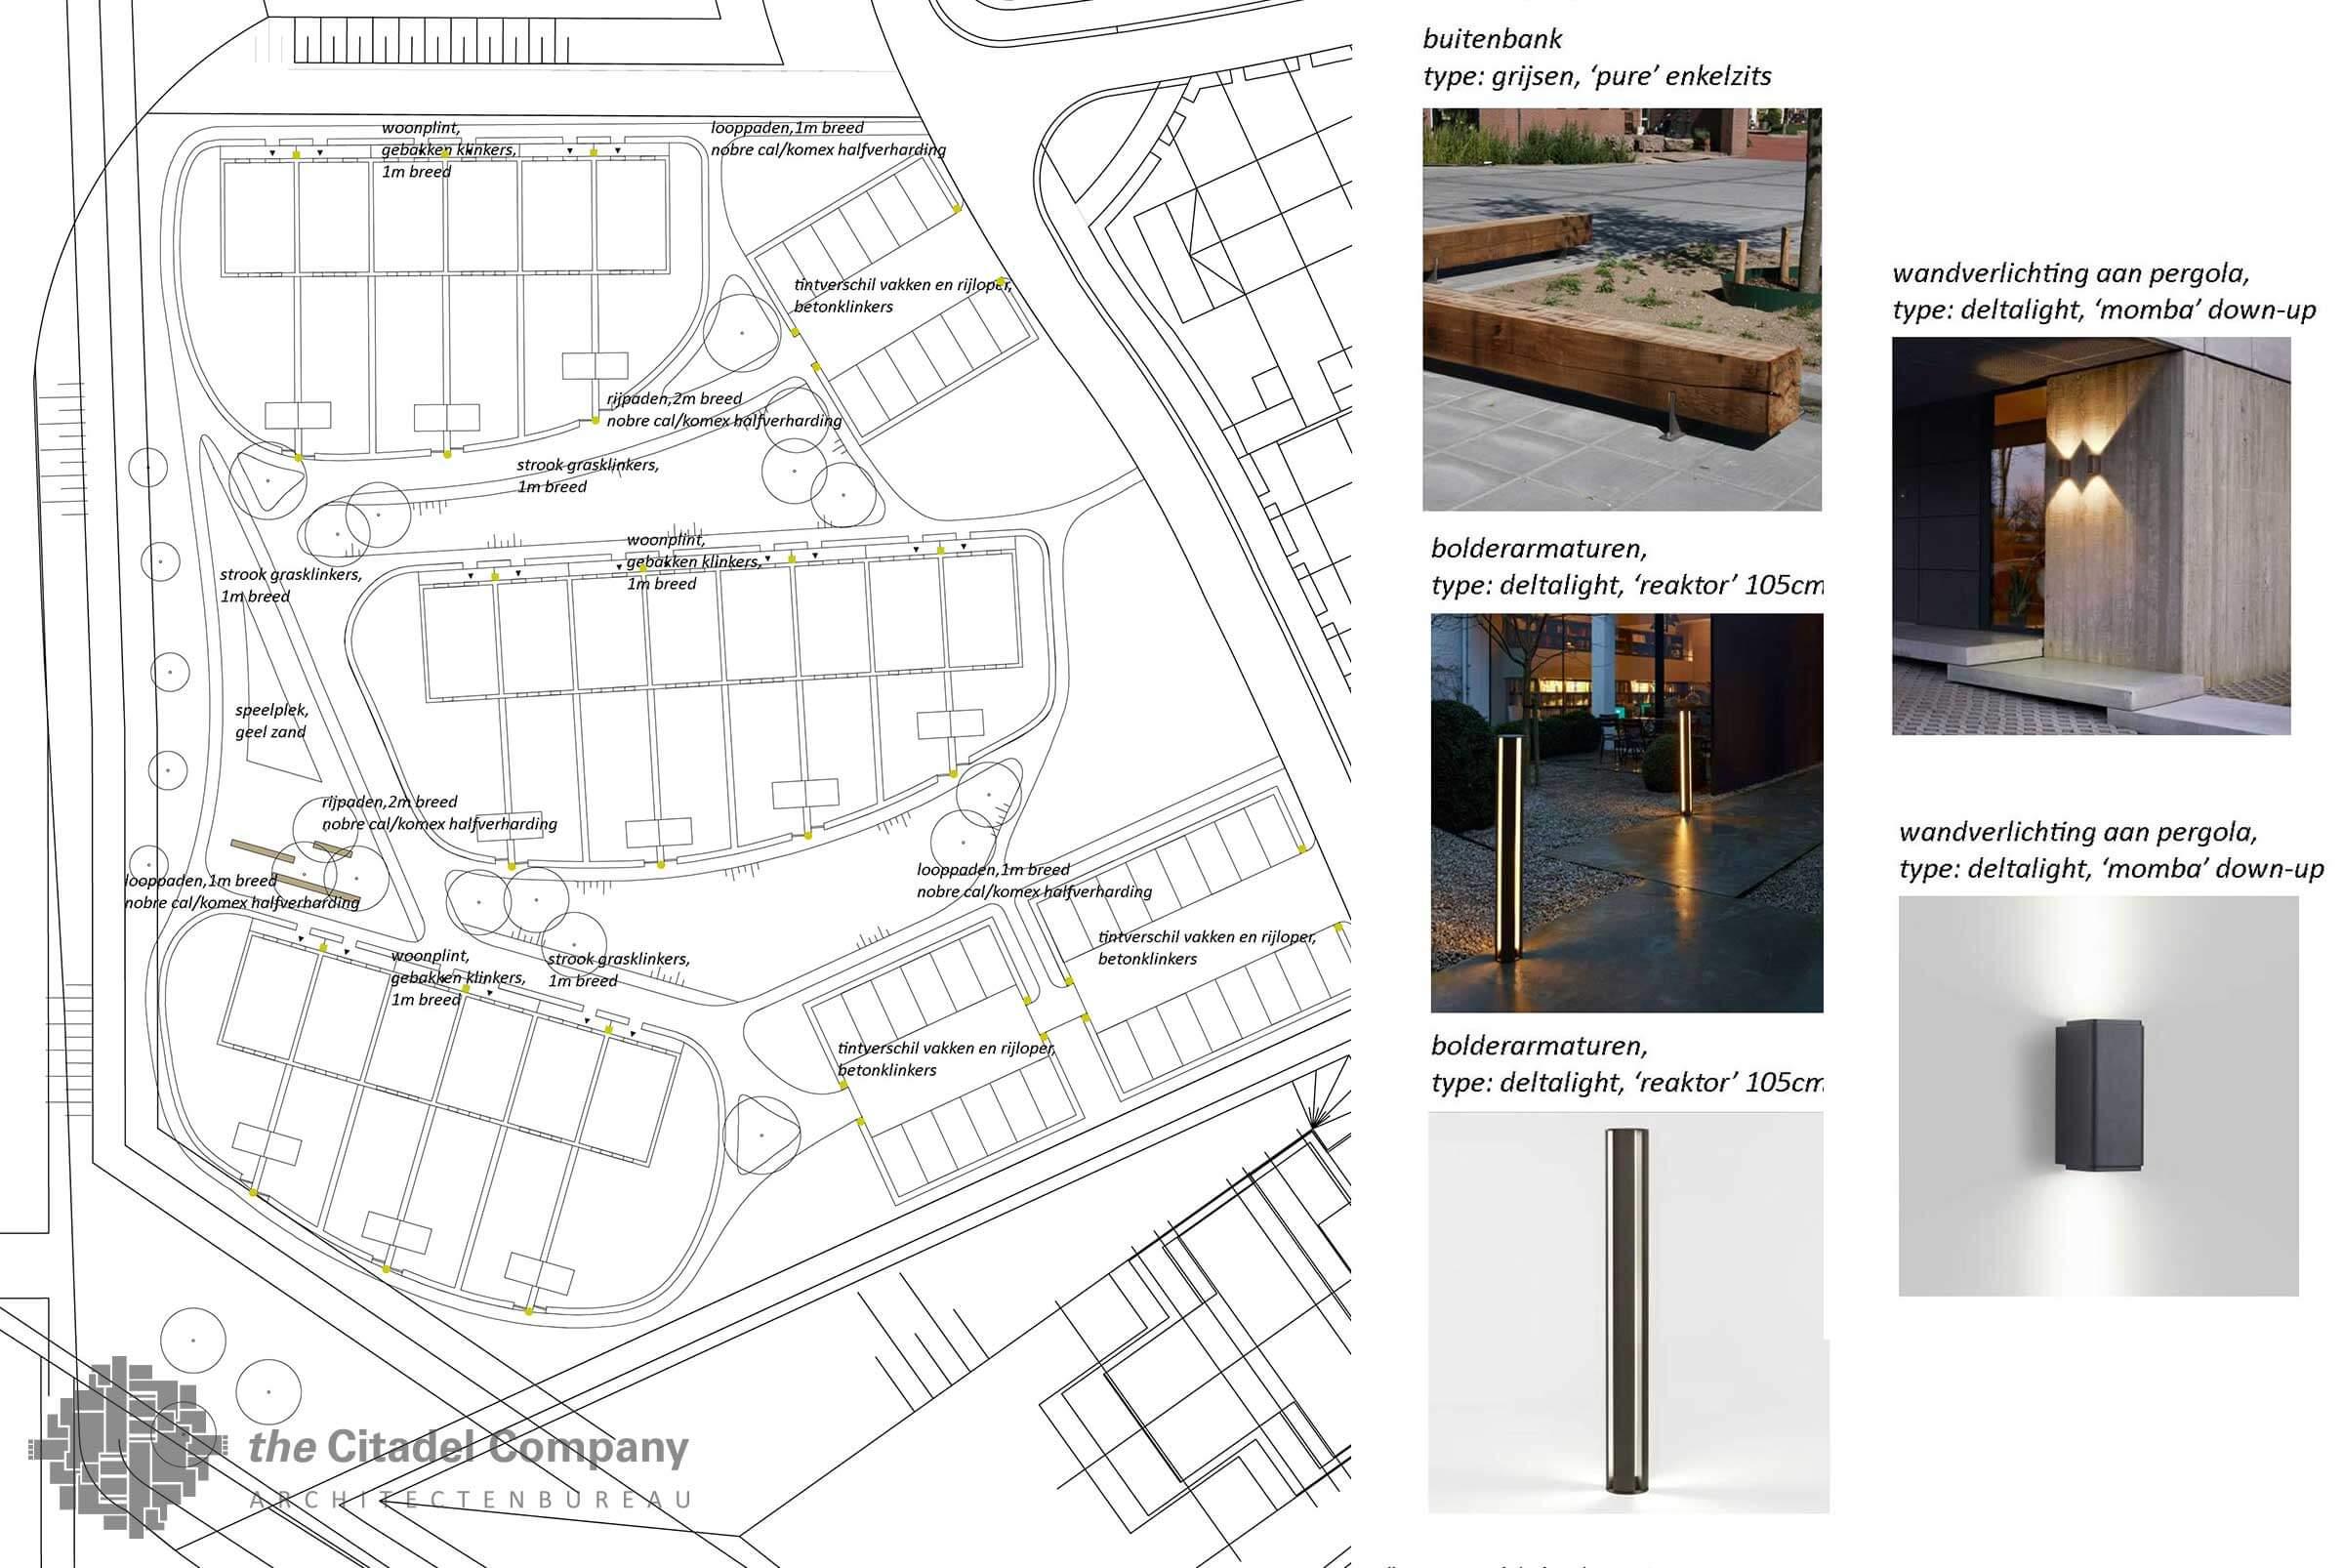 Stedenbouwkundig plan Vrij Werkeren Zwolle_Element en Verlichtingsplan